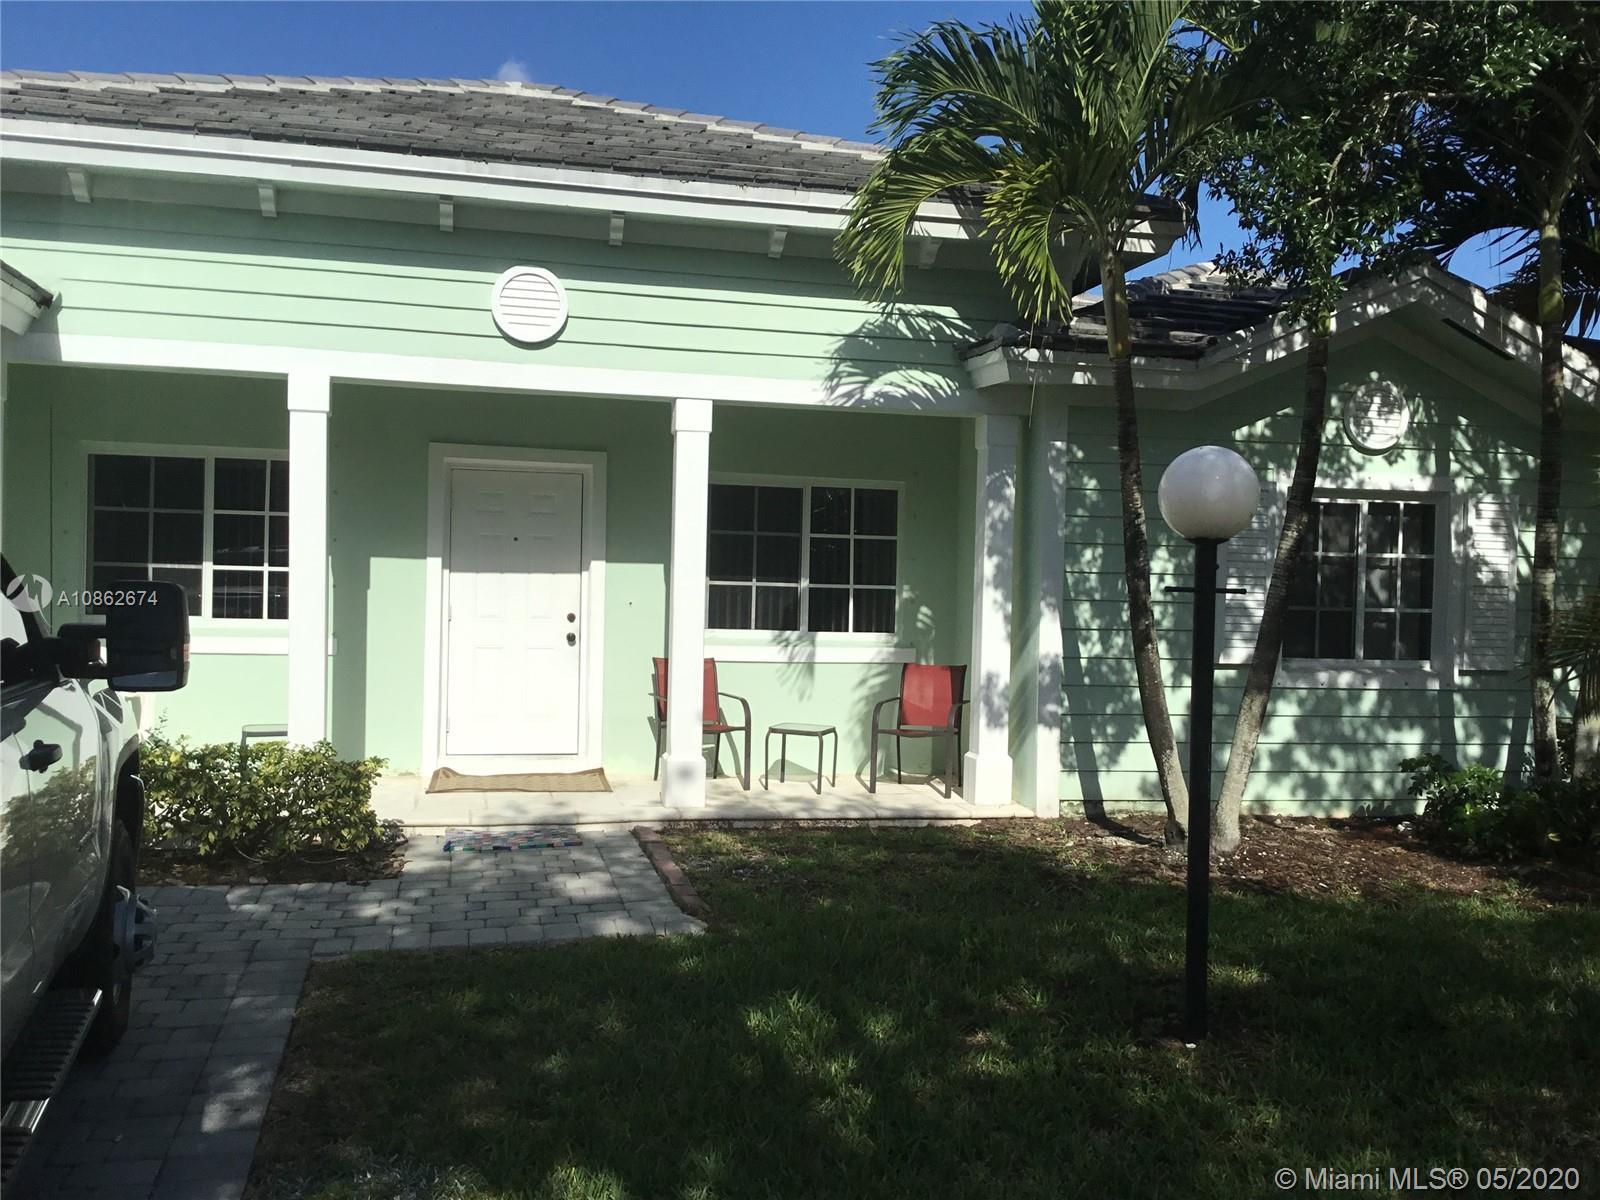 345 NE 29th Ter, Homestead, FL 33033 - Homestead, FL real estate listing